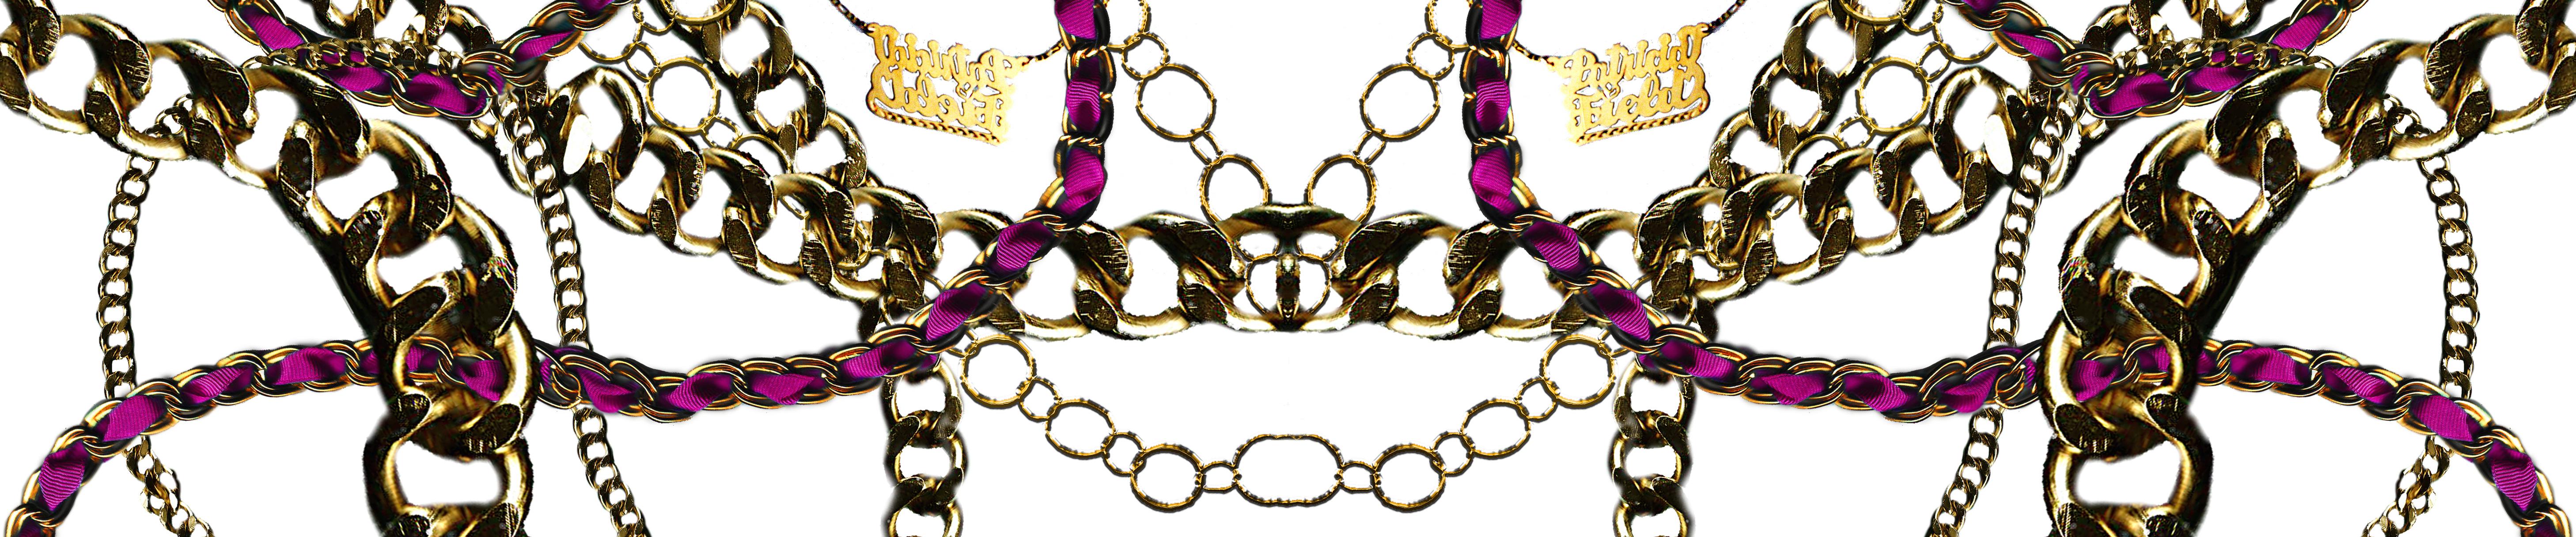 Gold Chain Print